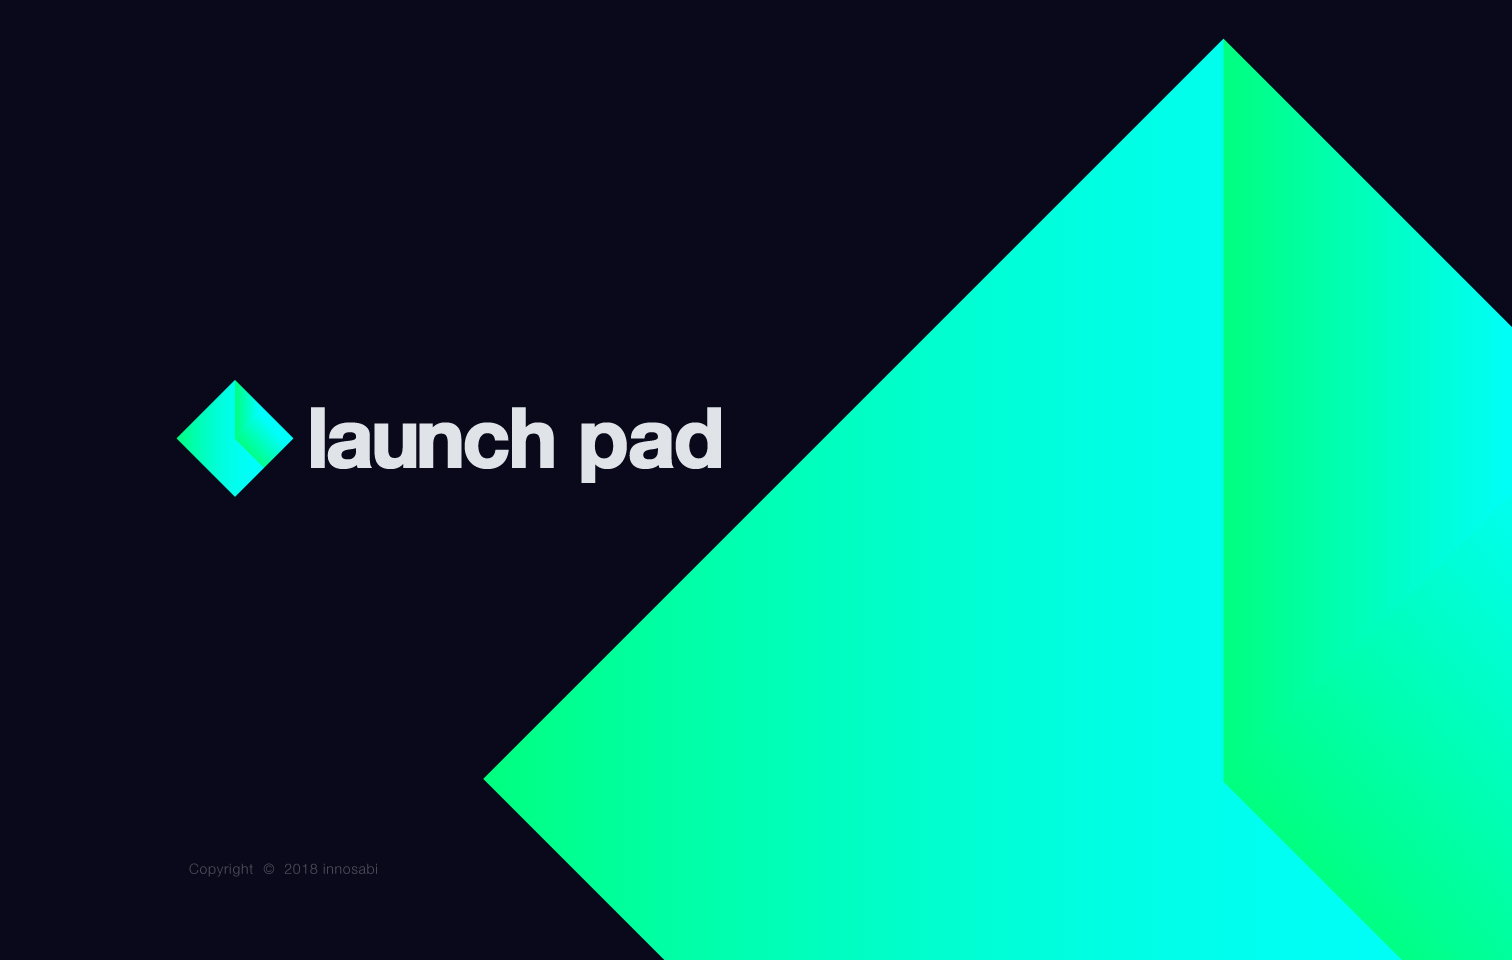 innosabi product branding launch pad